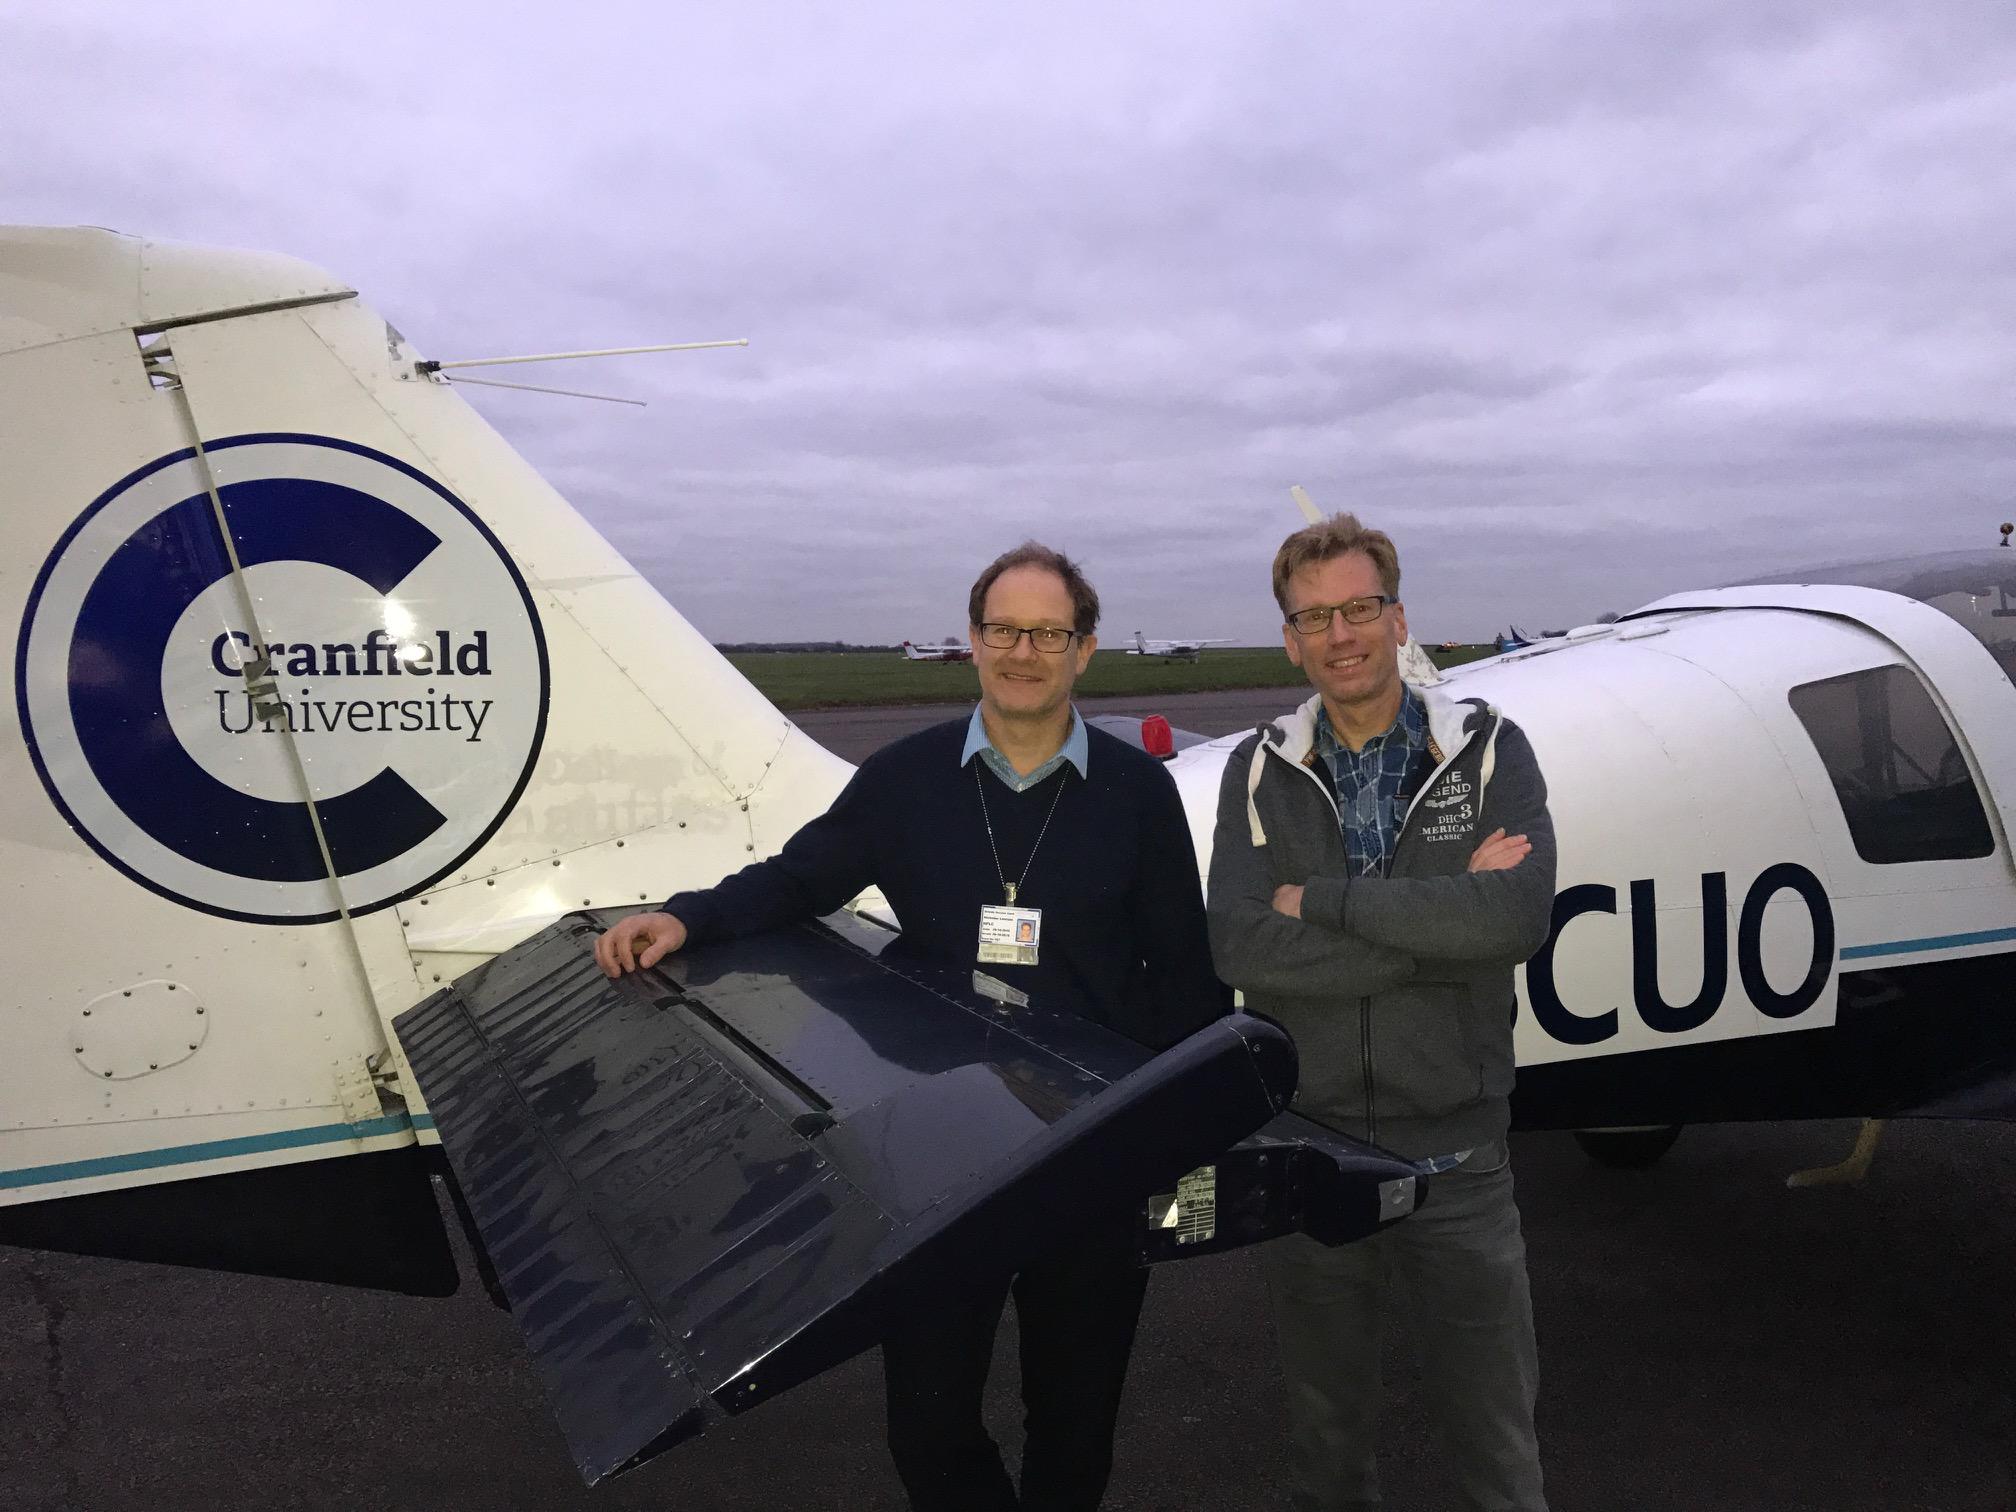 Professor Nick Lawson and Professor Eric Groen at Cranfield University